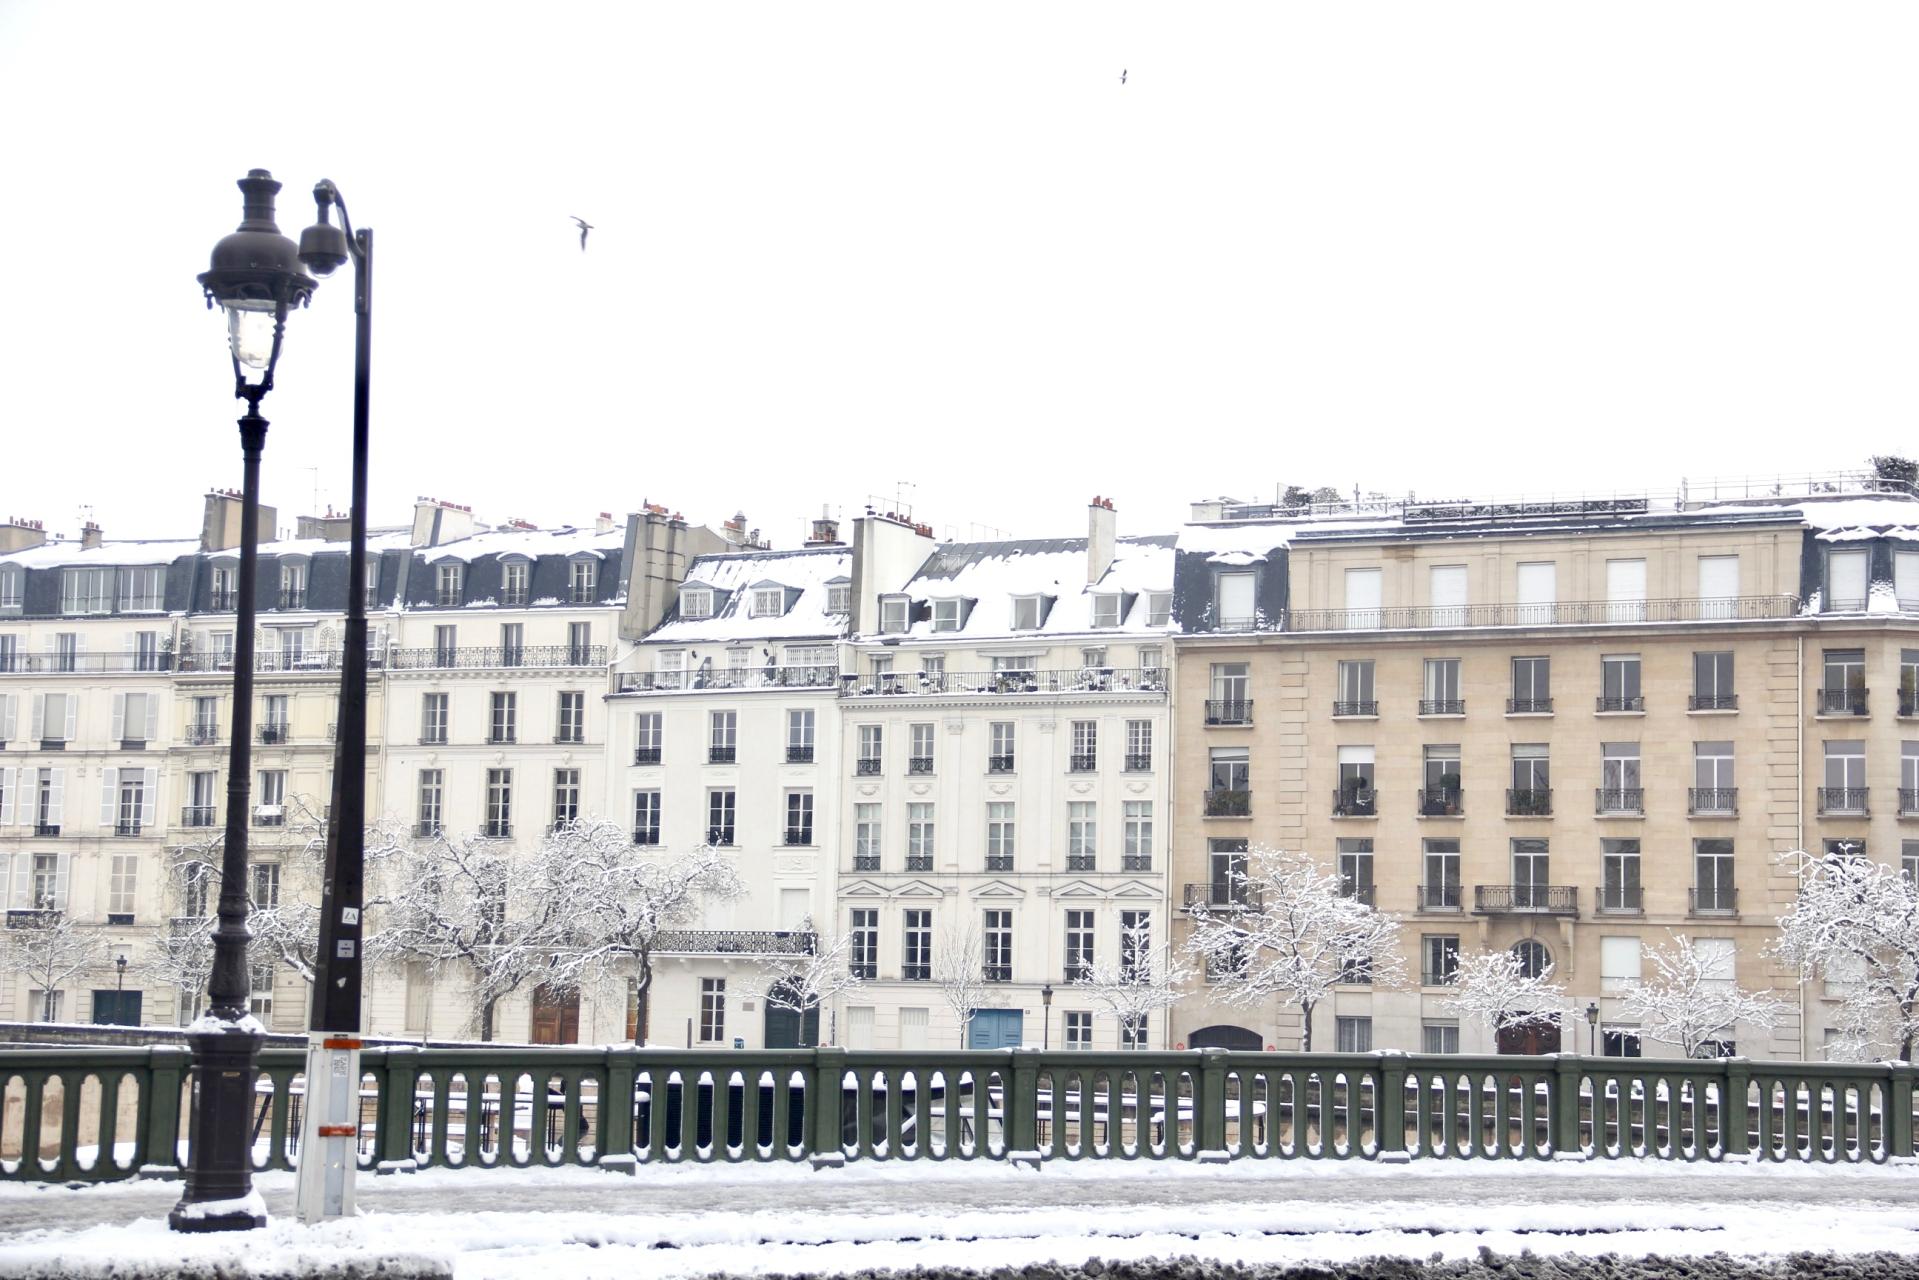 Snowy Paris - 10